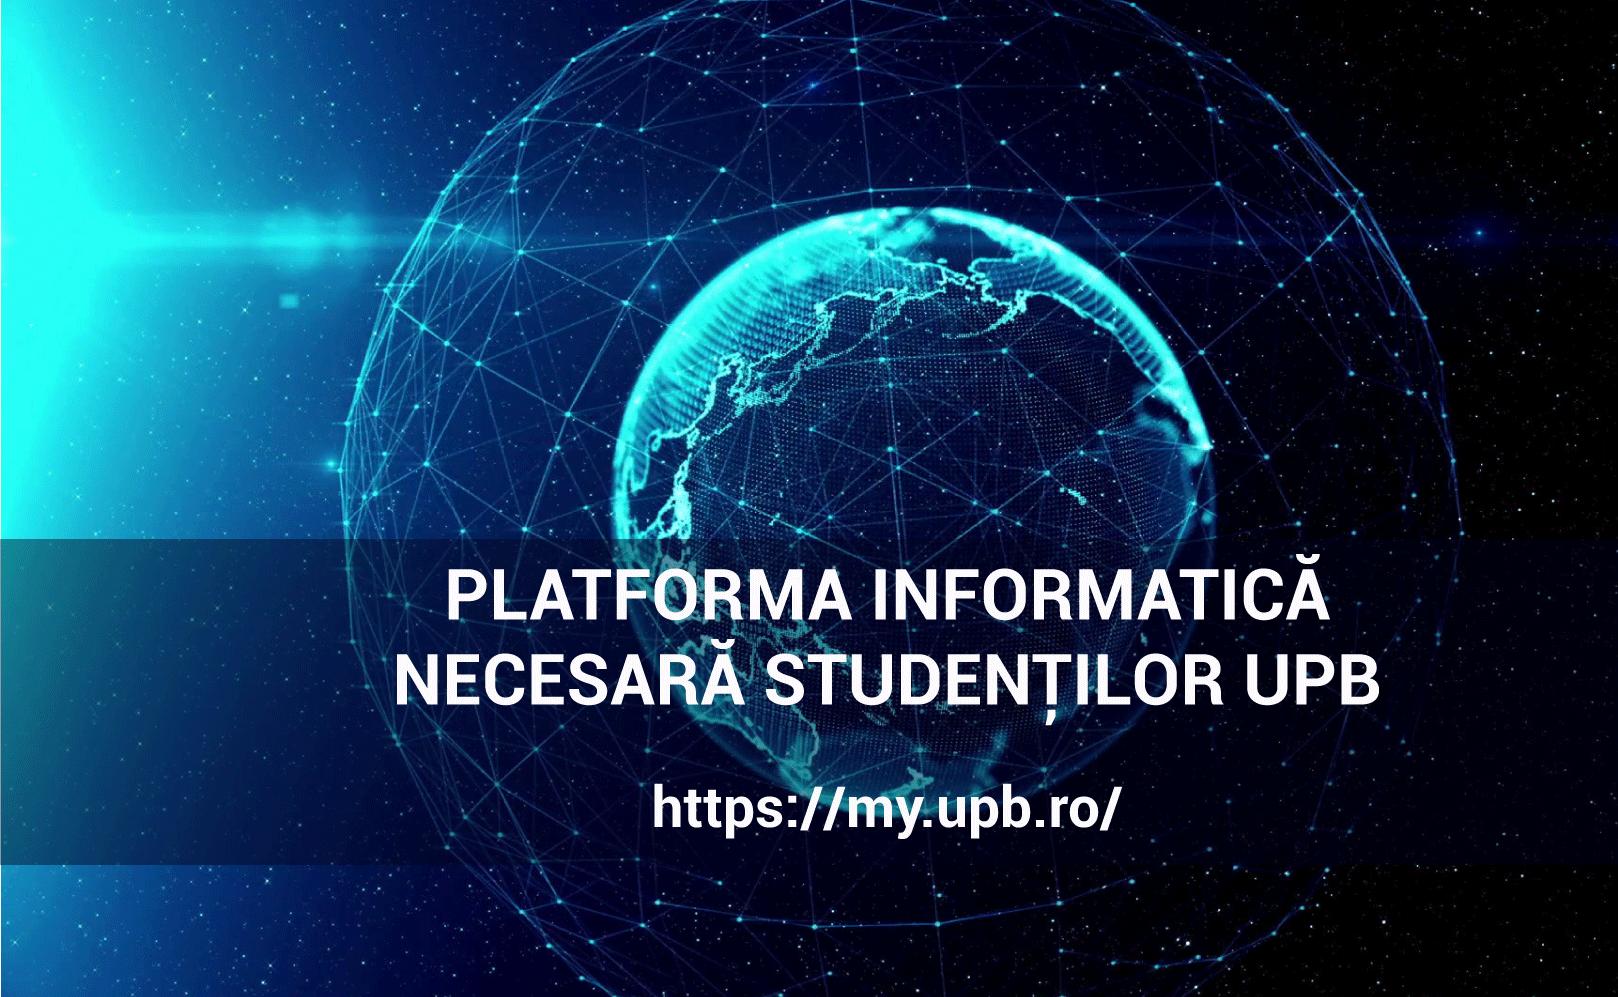 Platforma http://my.upb.ro/ – contine informatii importante pentru studenții UPB